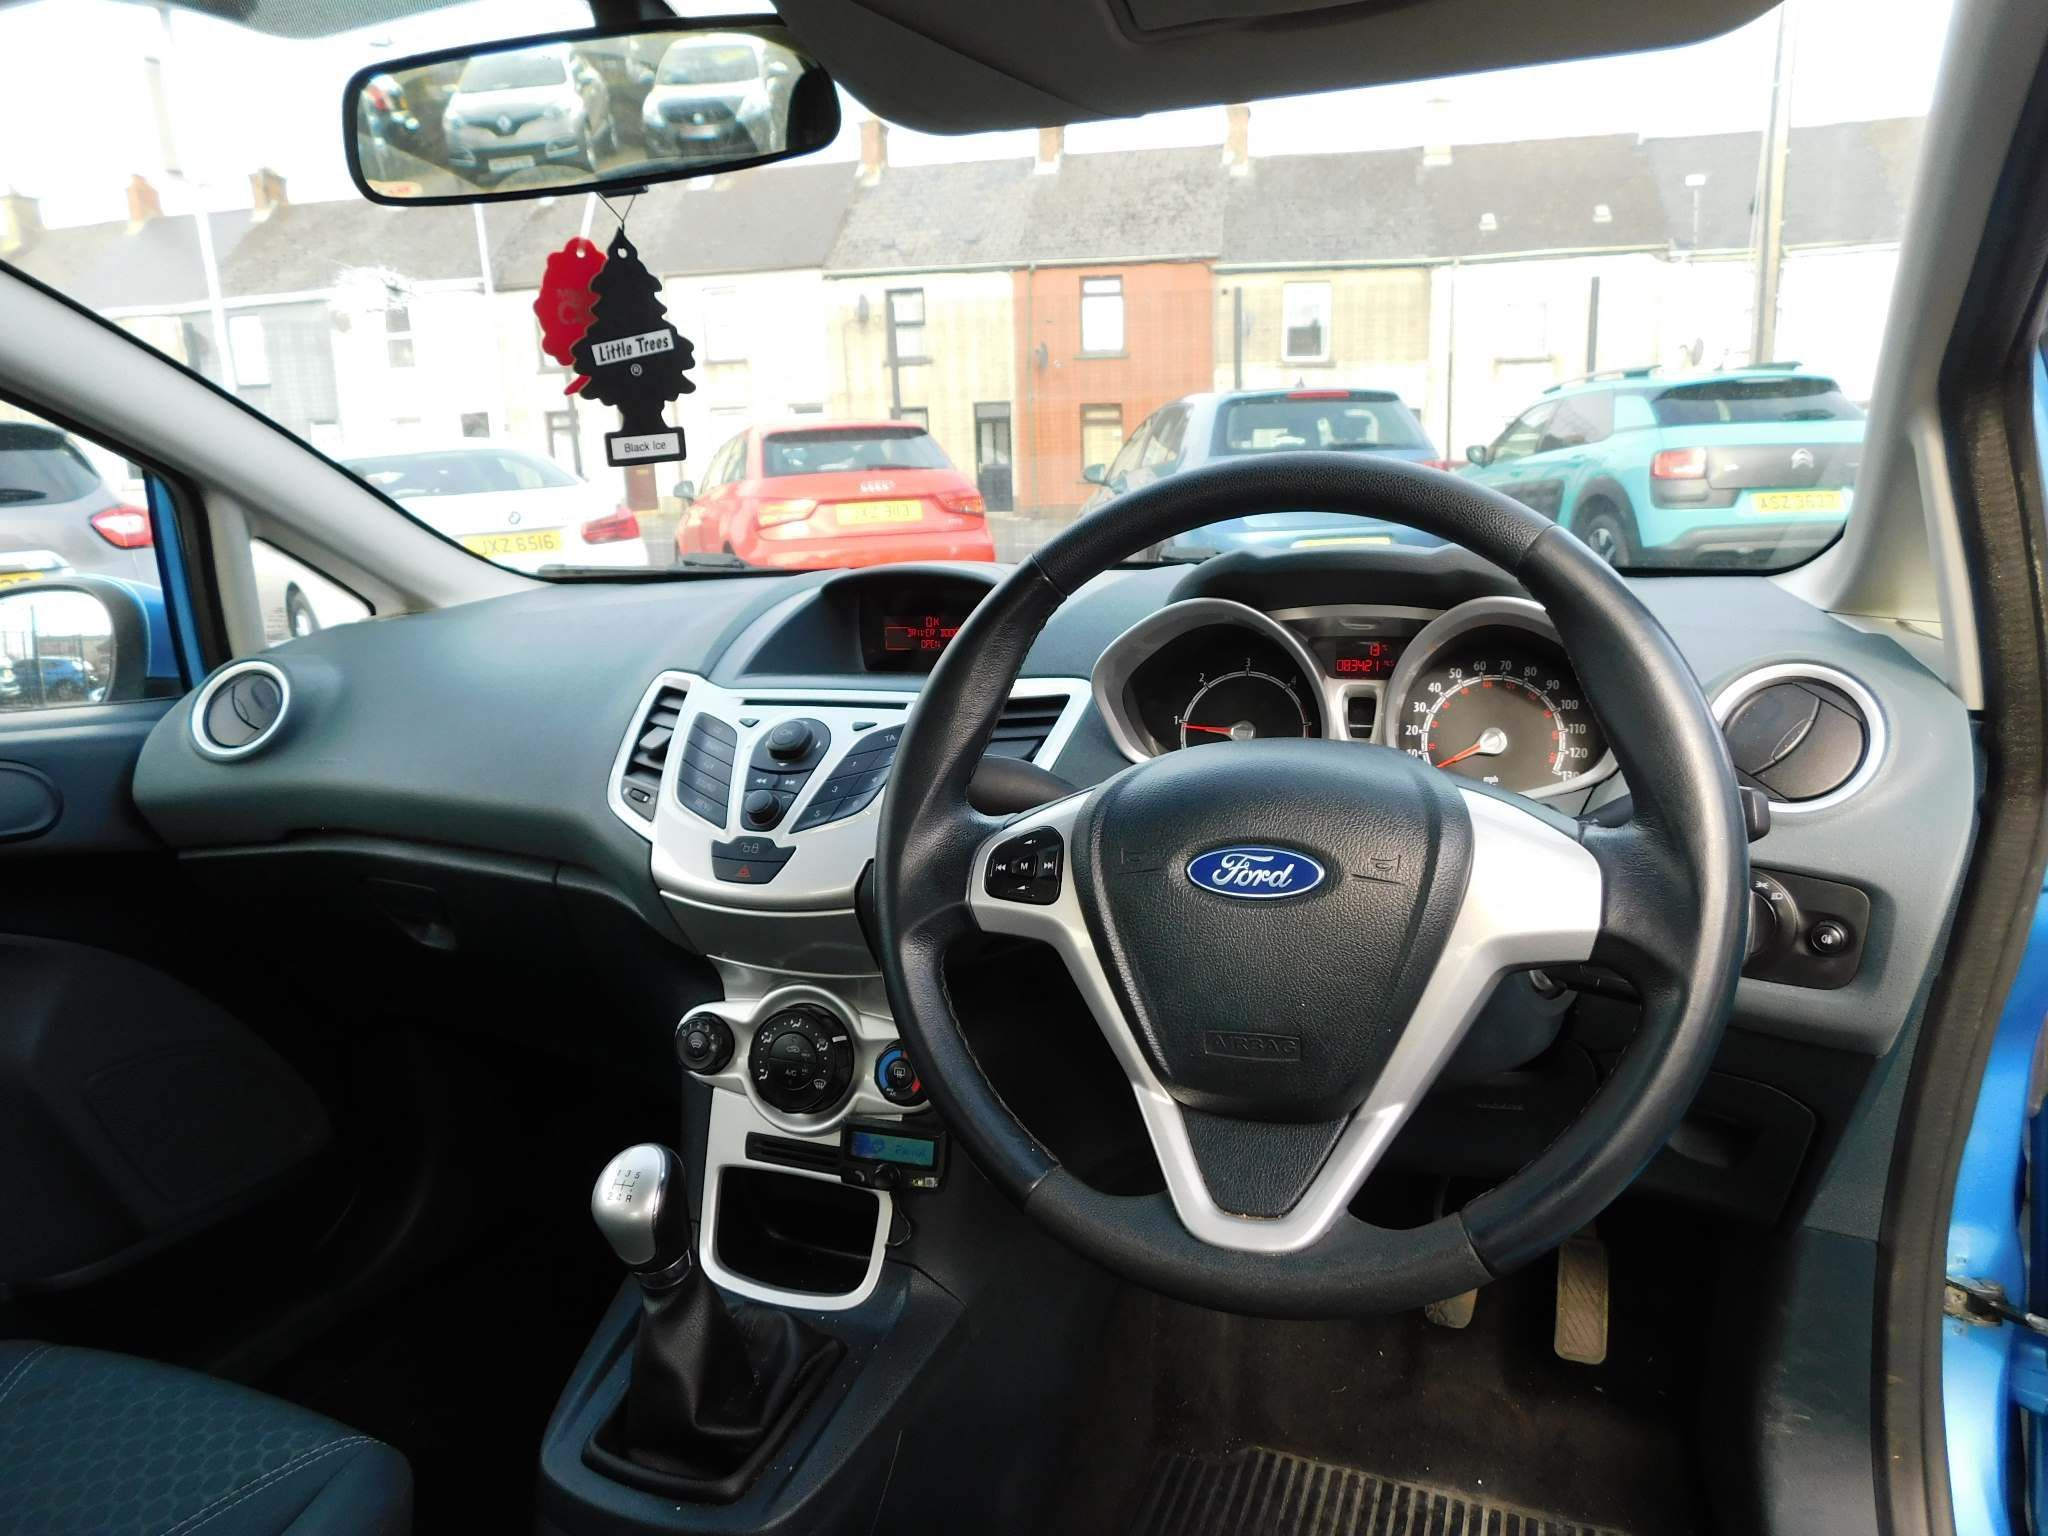 2010 FORD Fiesta 1.4 TDCi Zetec Diesel Manual new timing belt,serviced – Meadow Cars Carrickfergus full